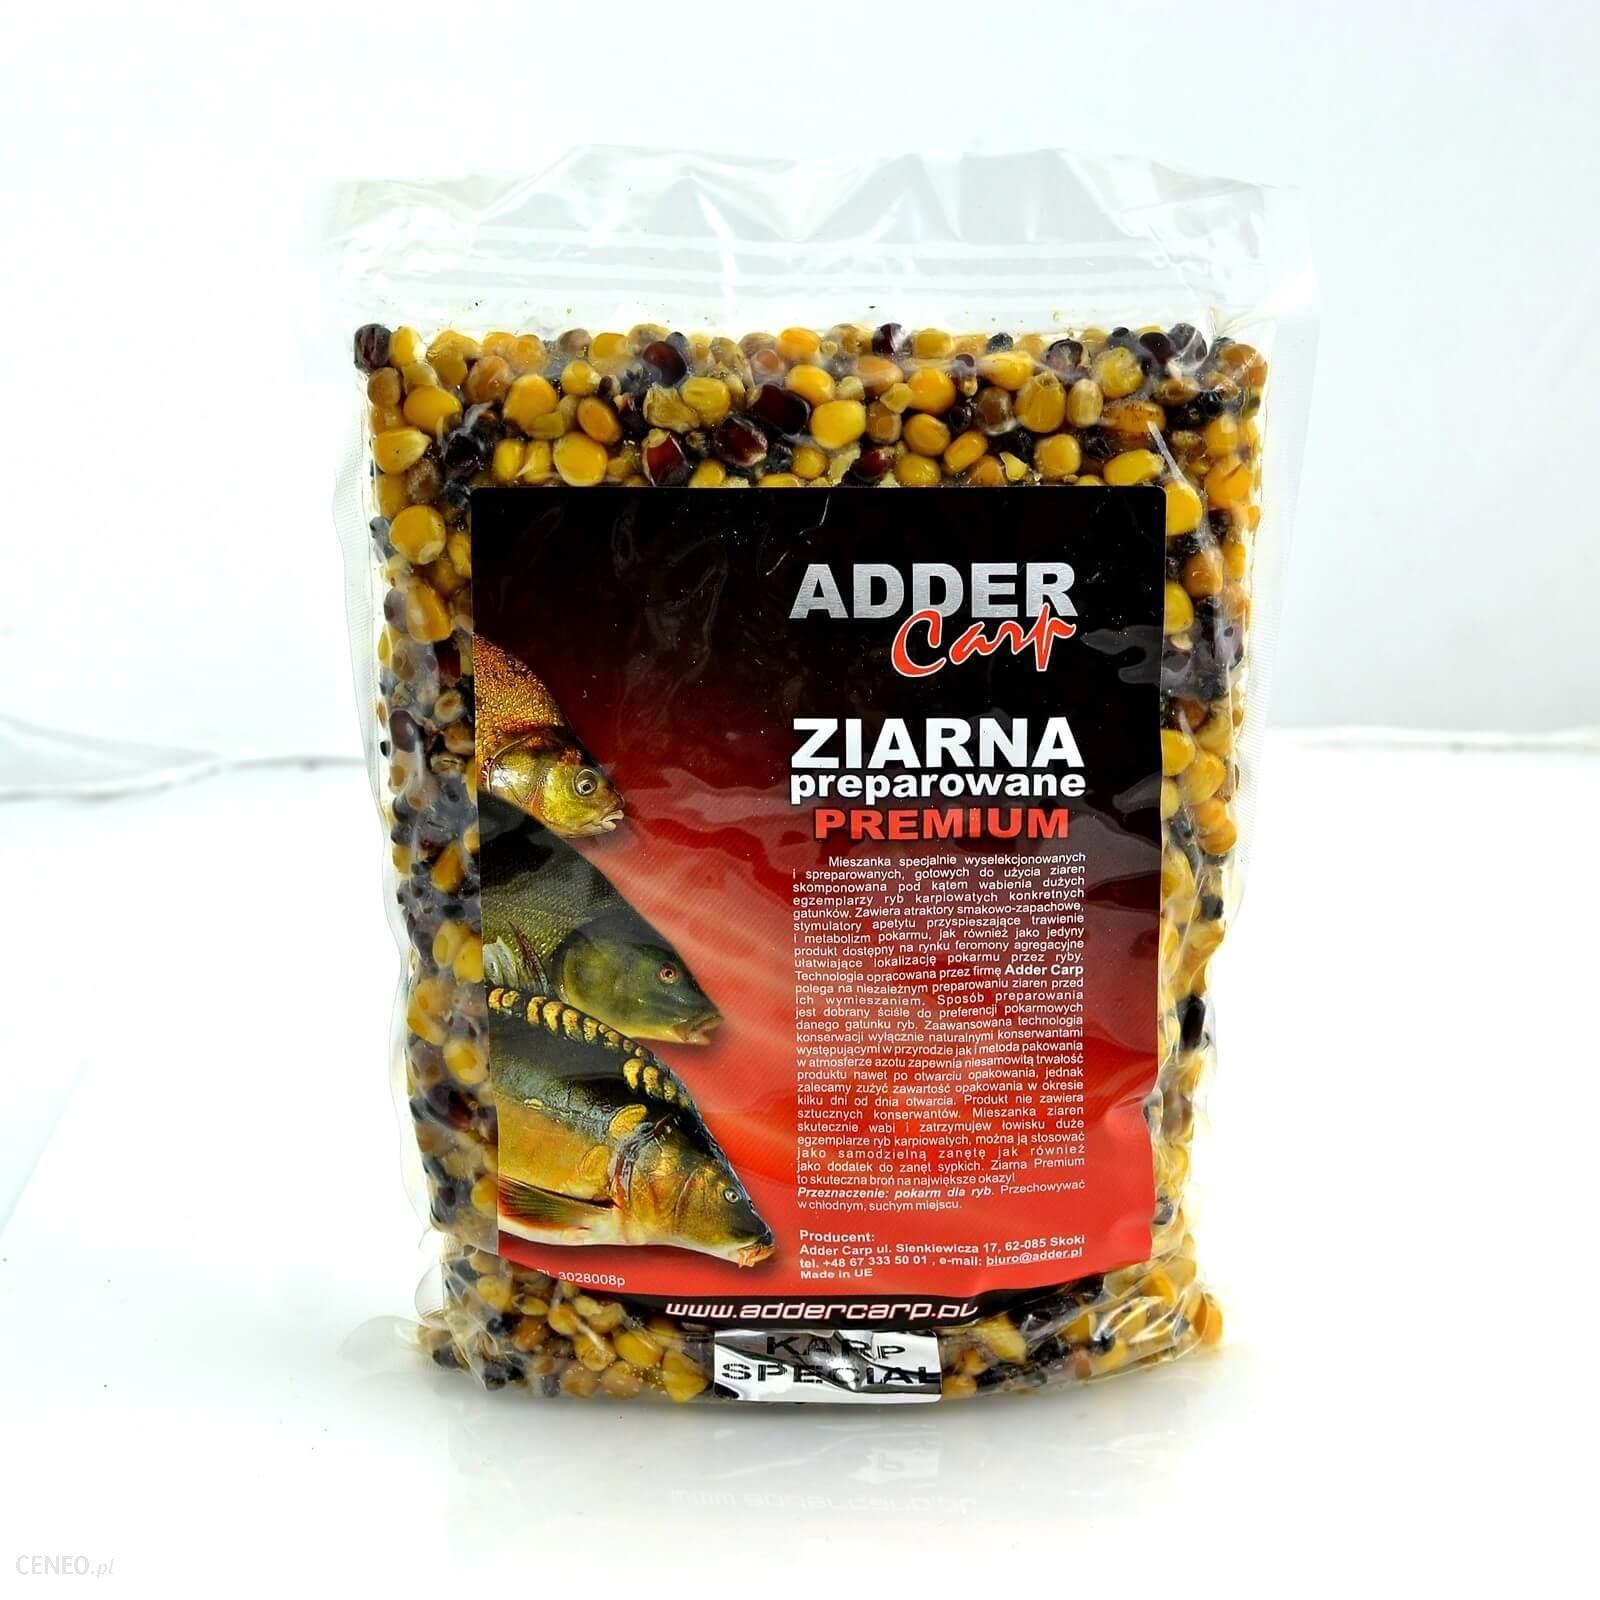 Ac Ziarna Preparowane Premium Karp Special 1Kg Adder Carp